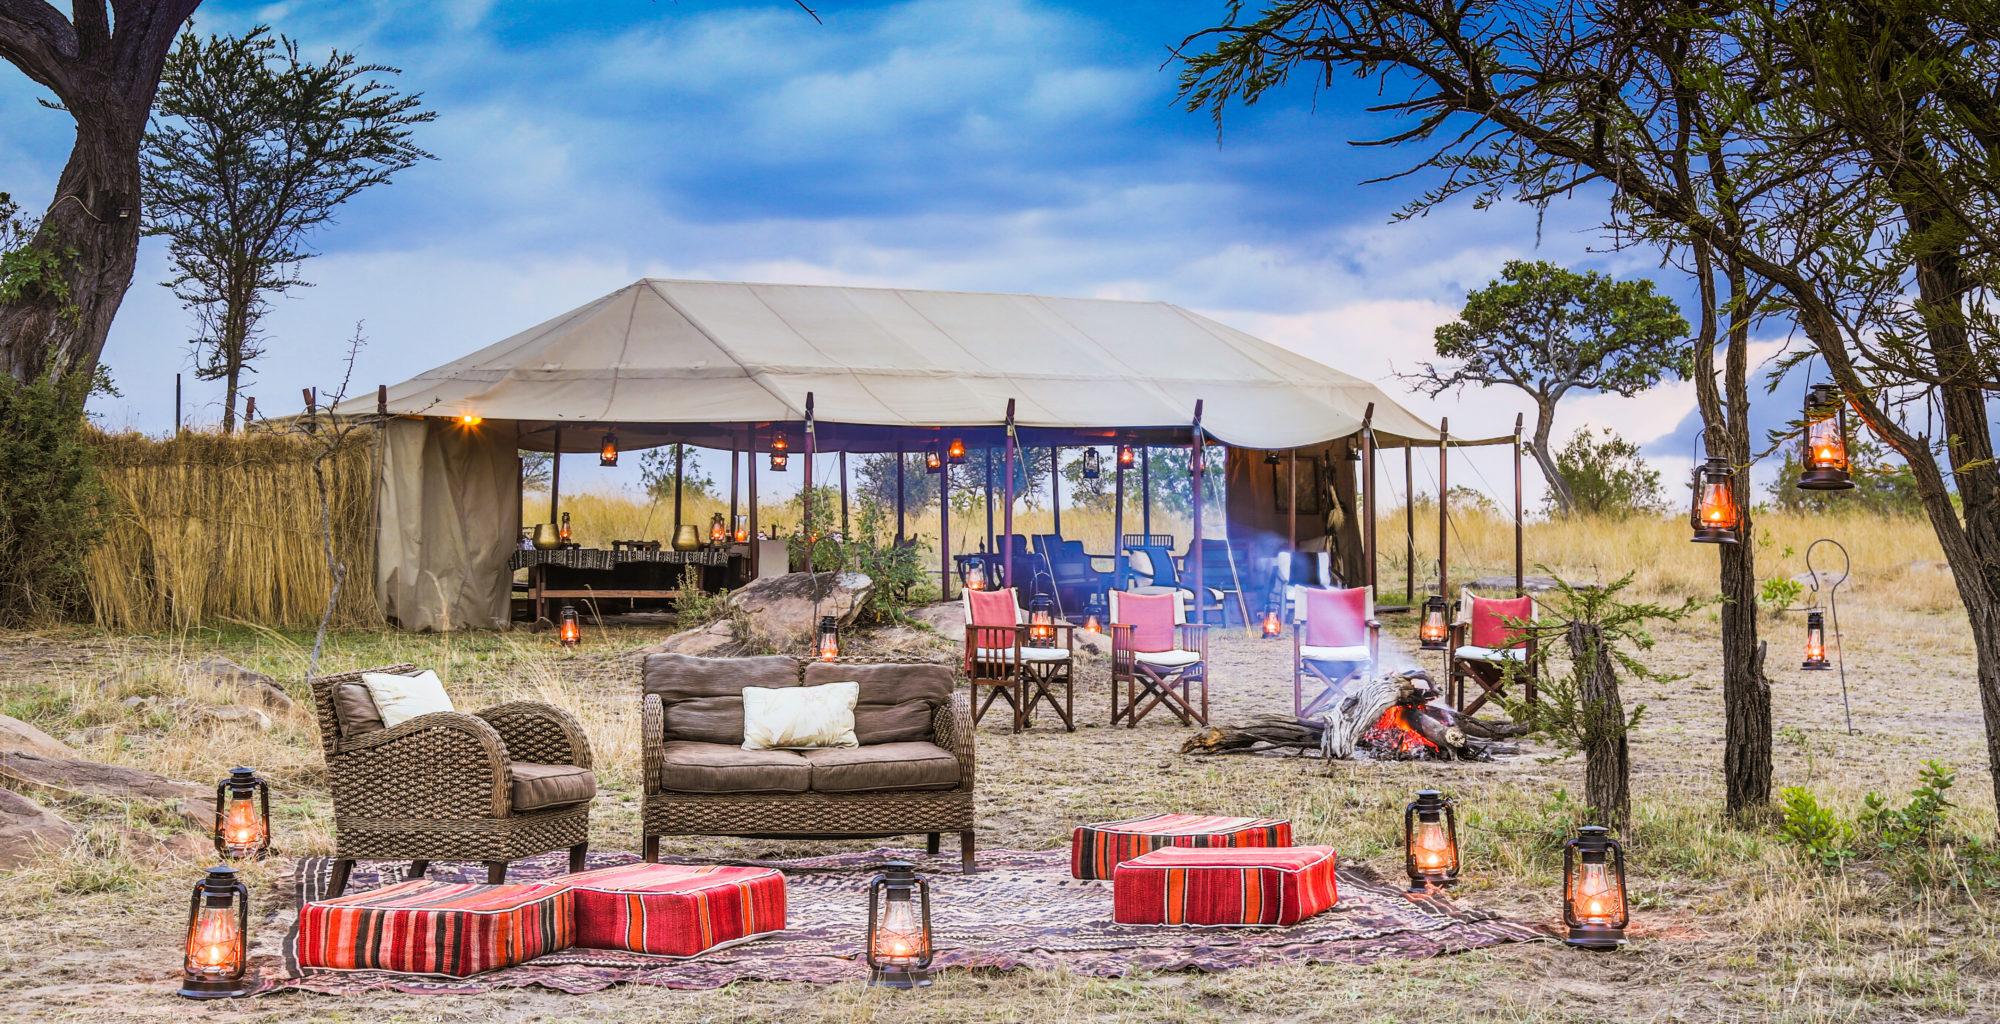 Tanzania-Legendary-Serengeti-Camp-Outdoor-Lounge